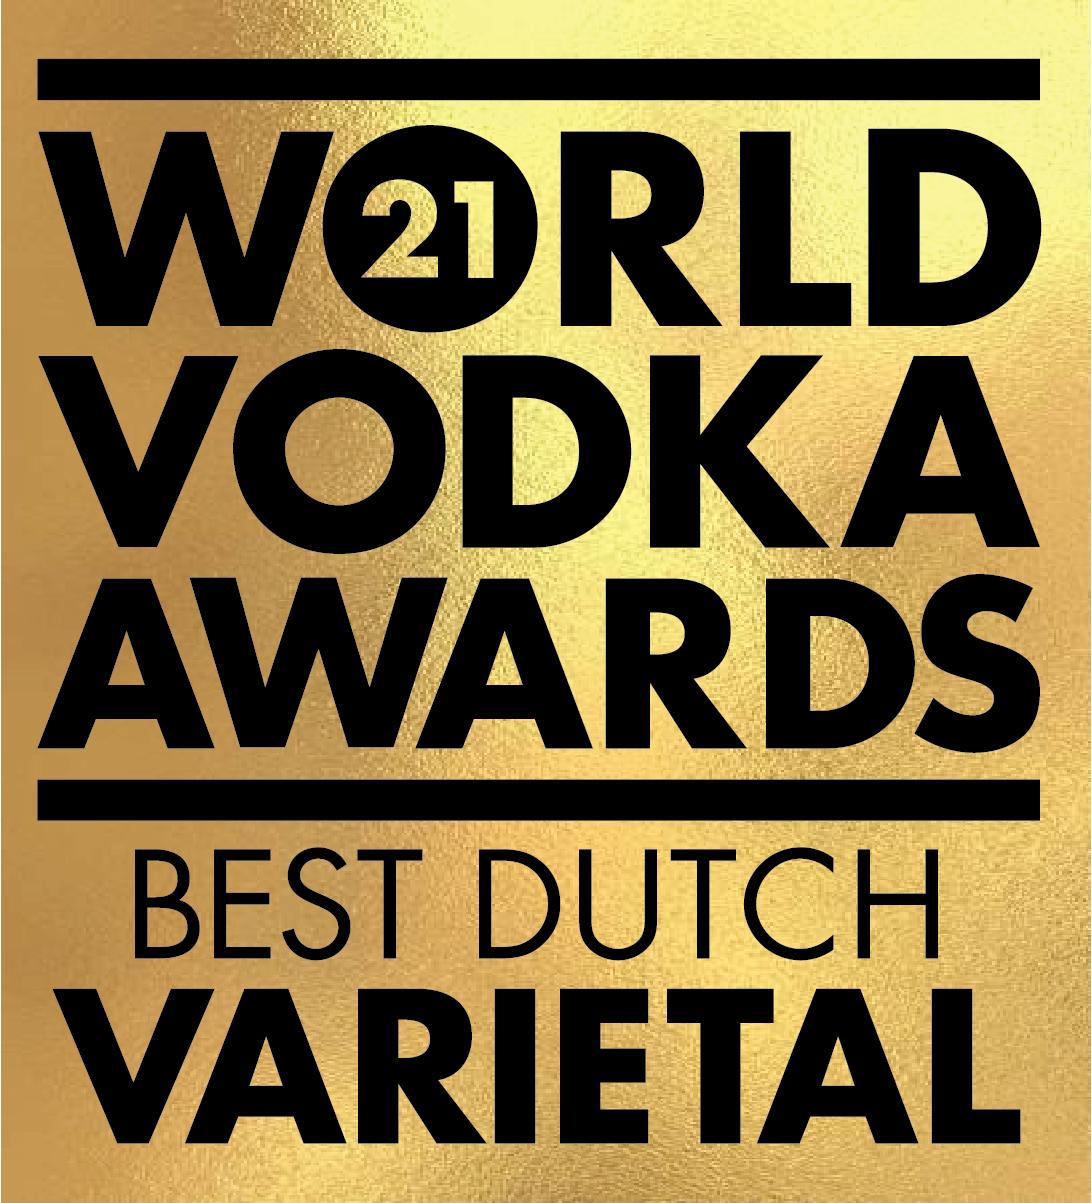 An Gold award won by the Stillery amsterdam which reads World Vodka Awards 2021 Best Dutch Varietal